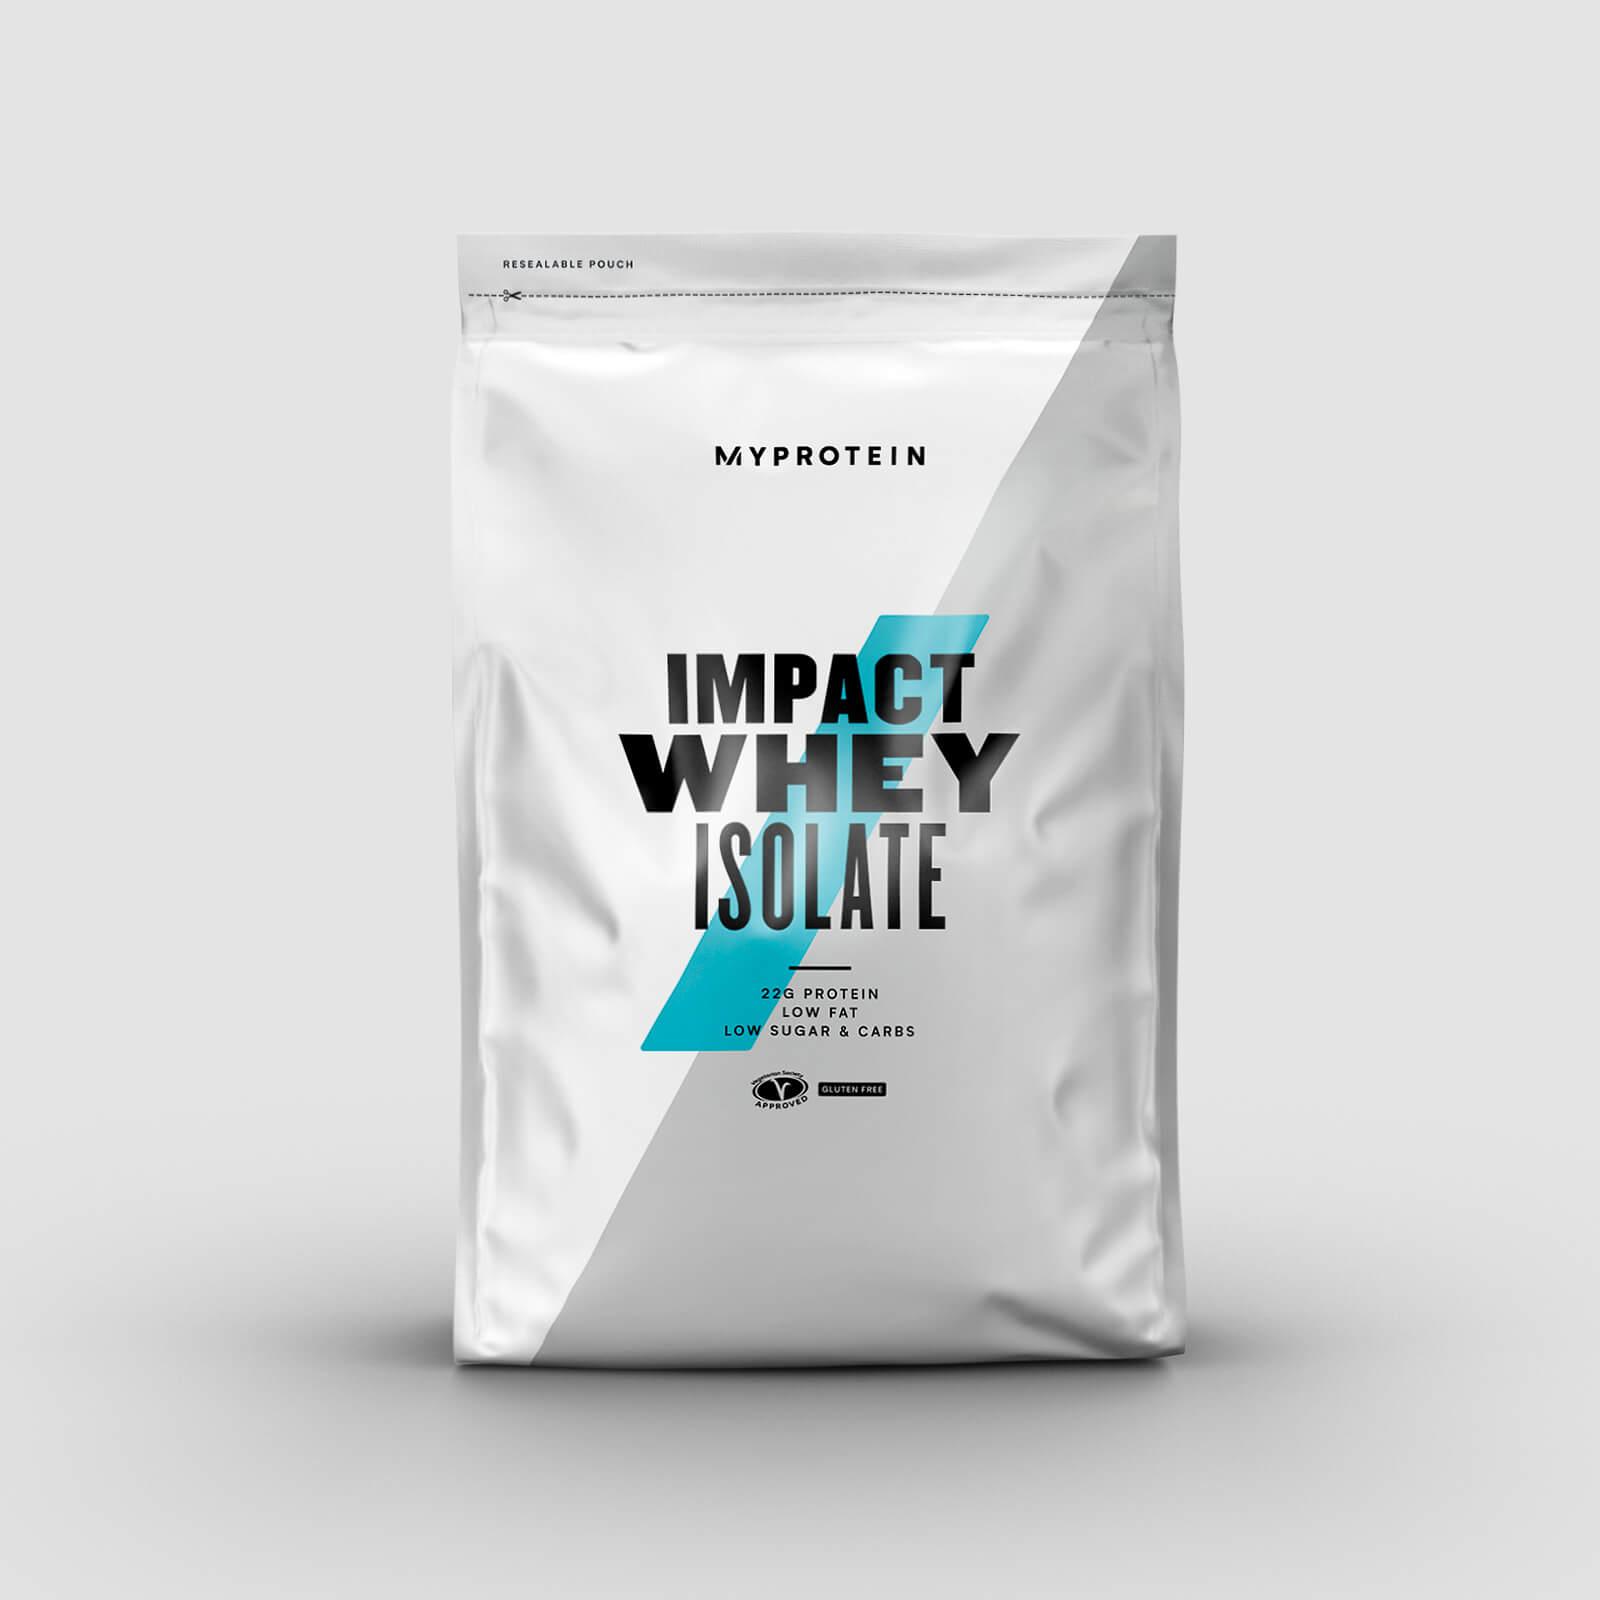 Myprotein Impact Whey Isolate - 2.5kg - Tè al latte